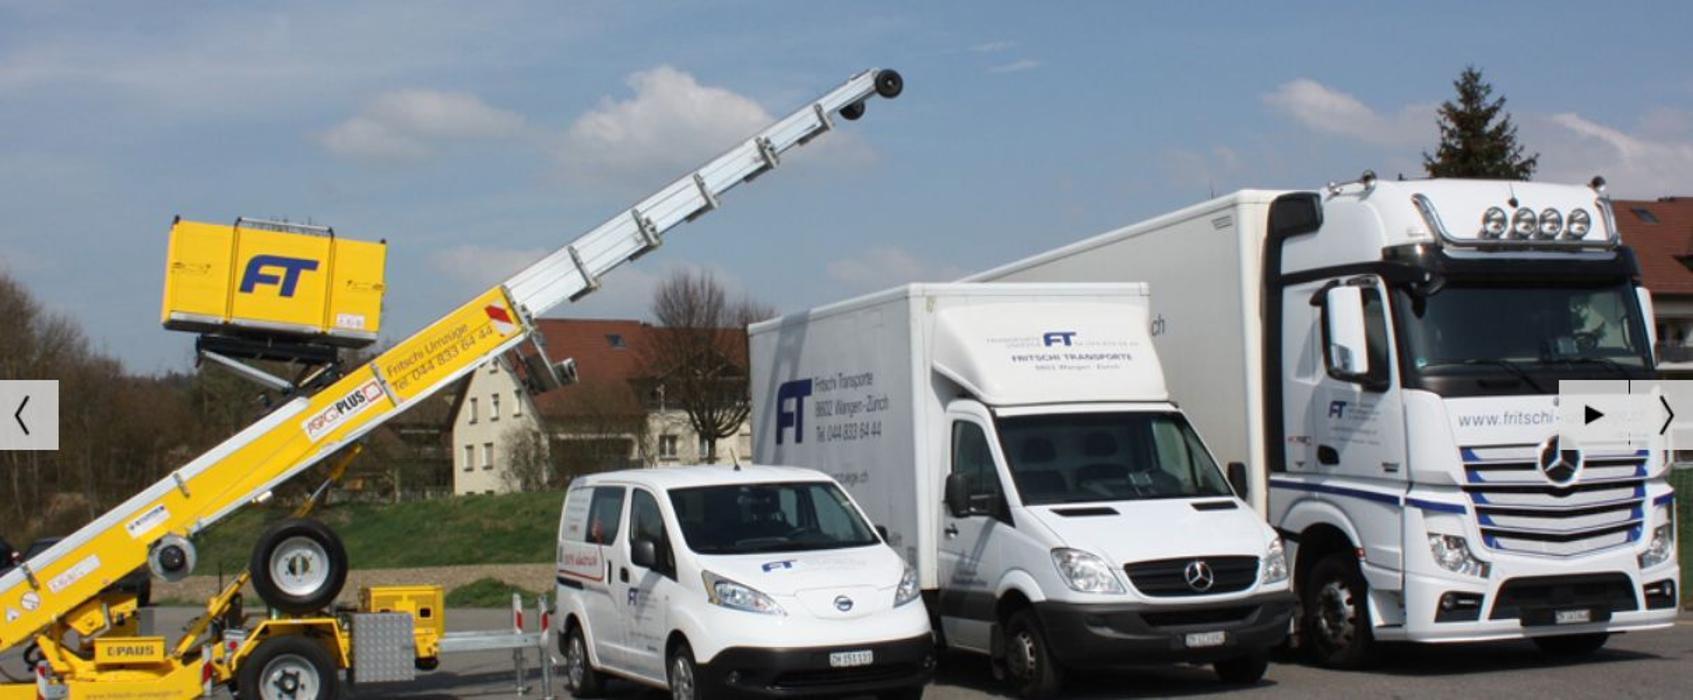 Fritschi Transporte Umzuge Ag Wangen Bei Dubendorf